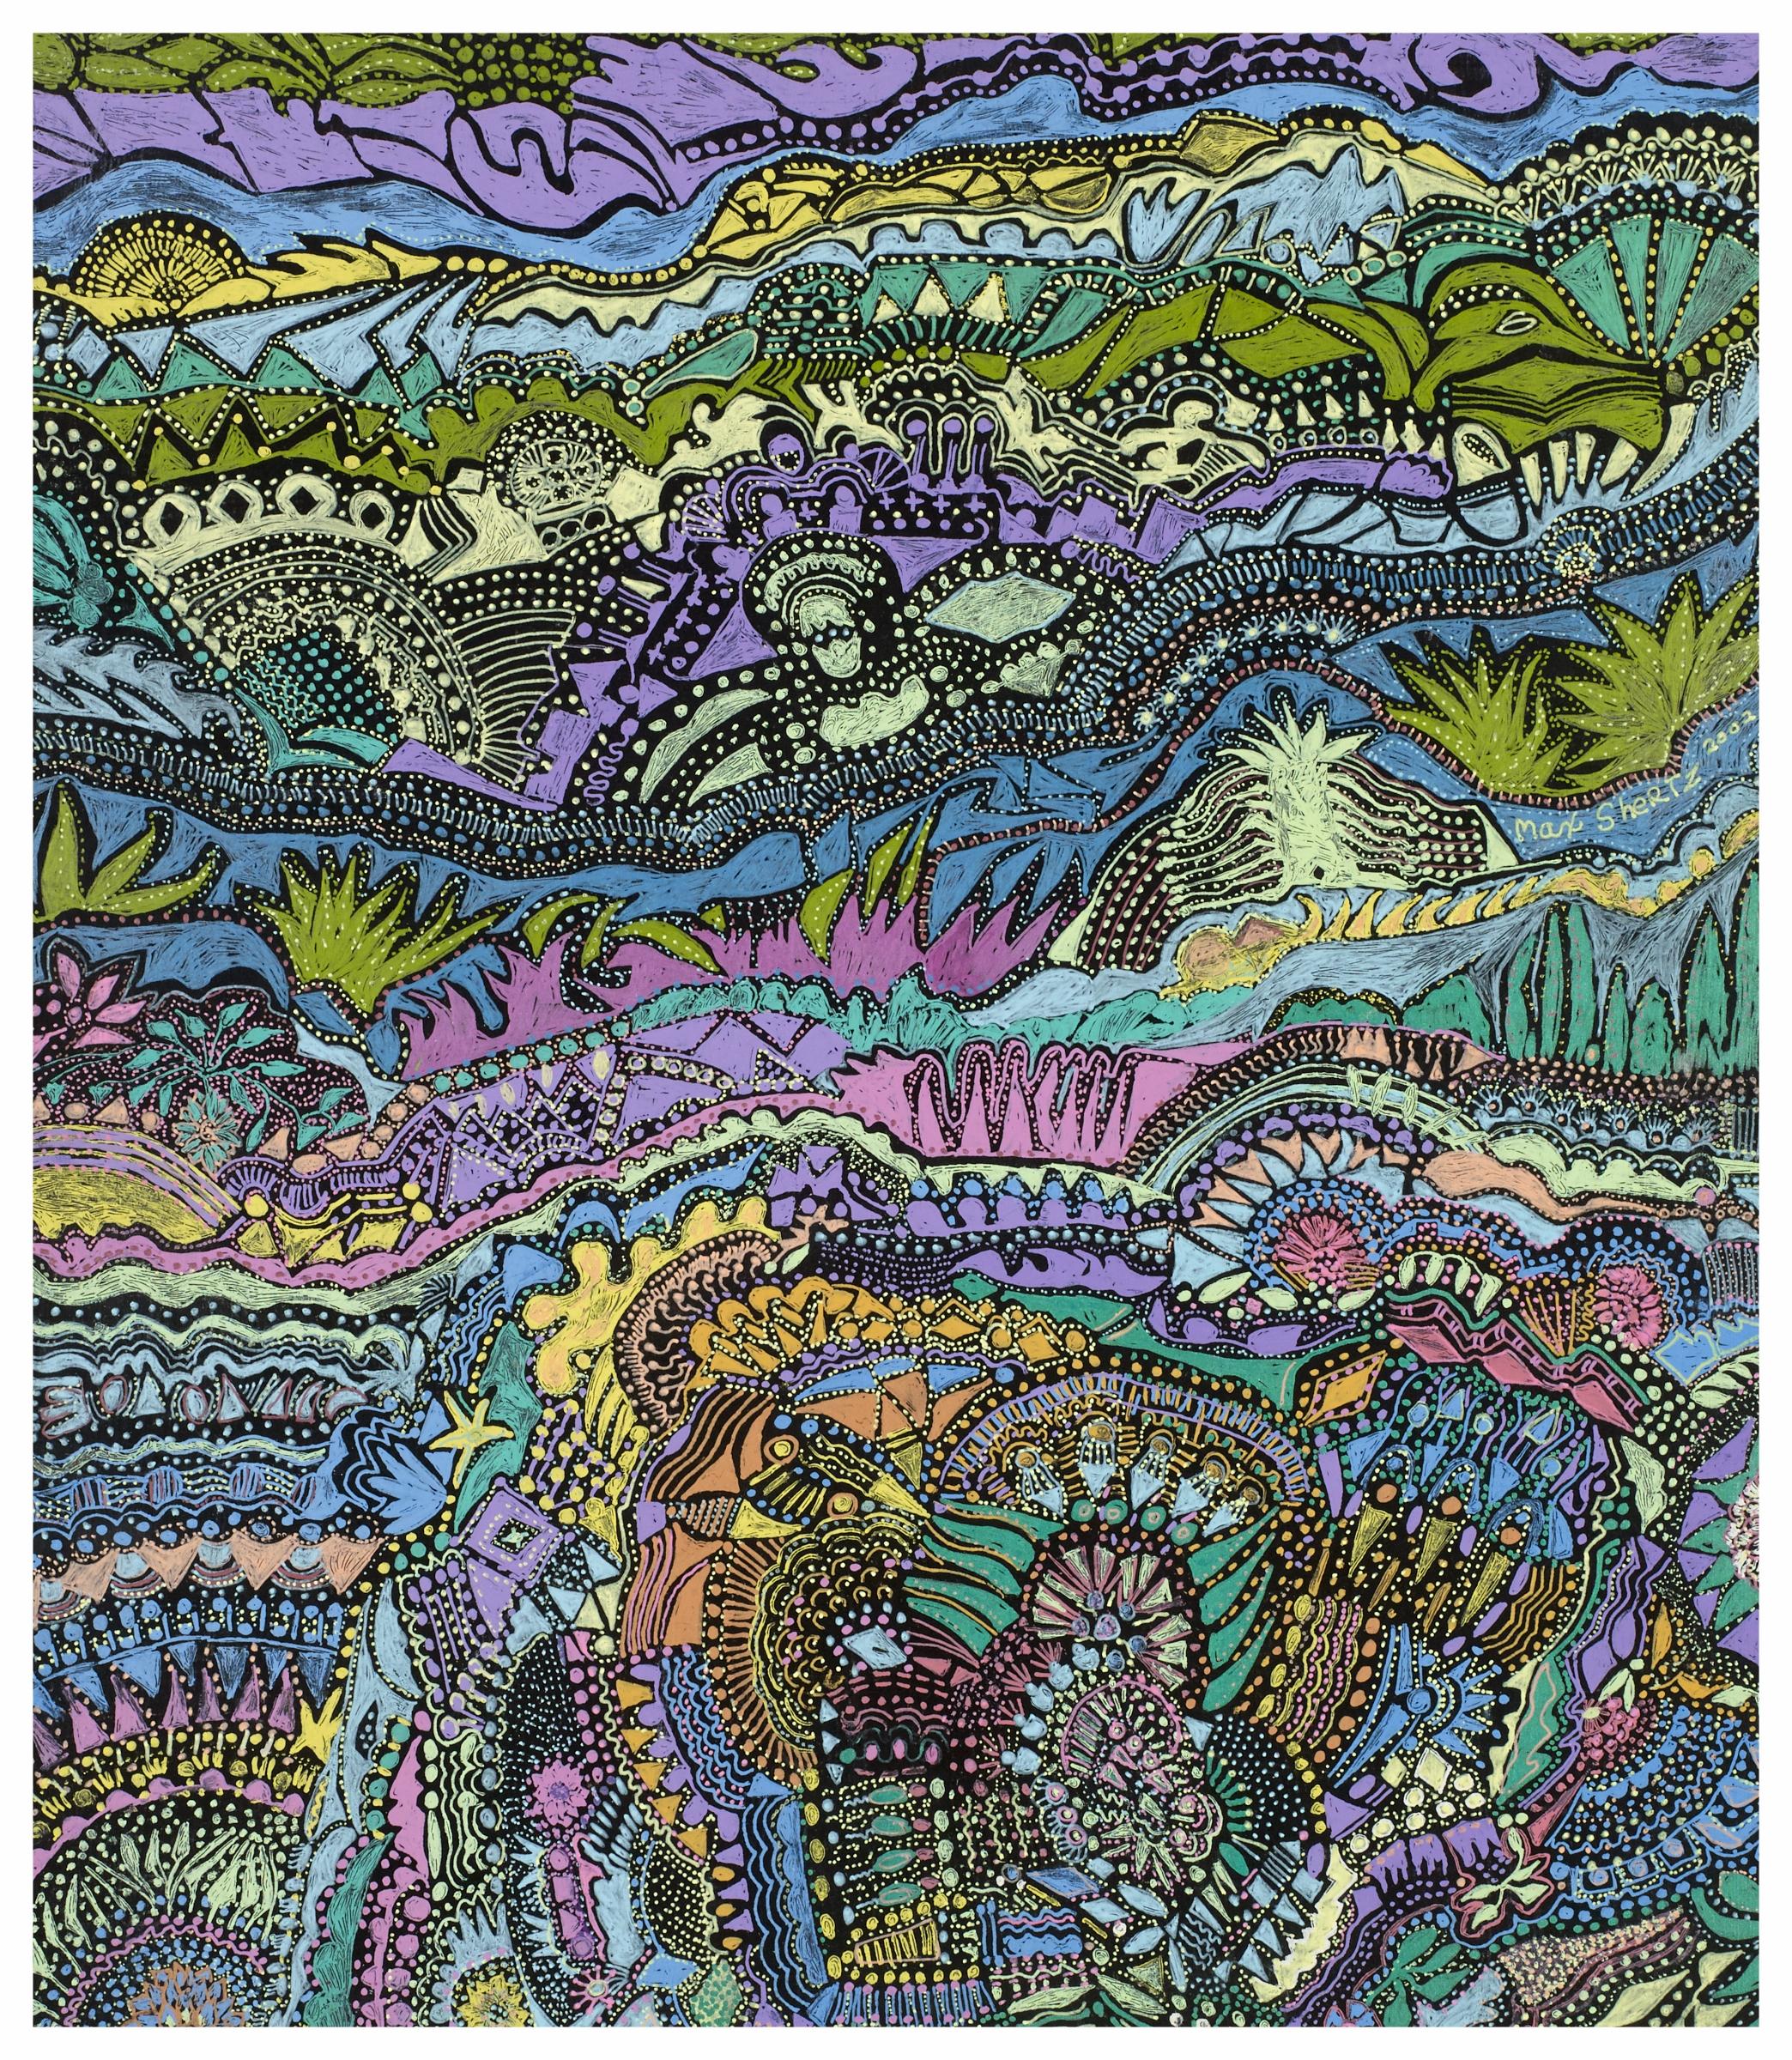 Dreams Of Bali 2000 12x10 Gel Pens